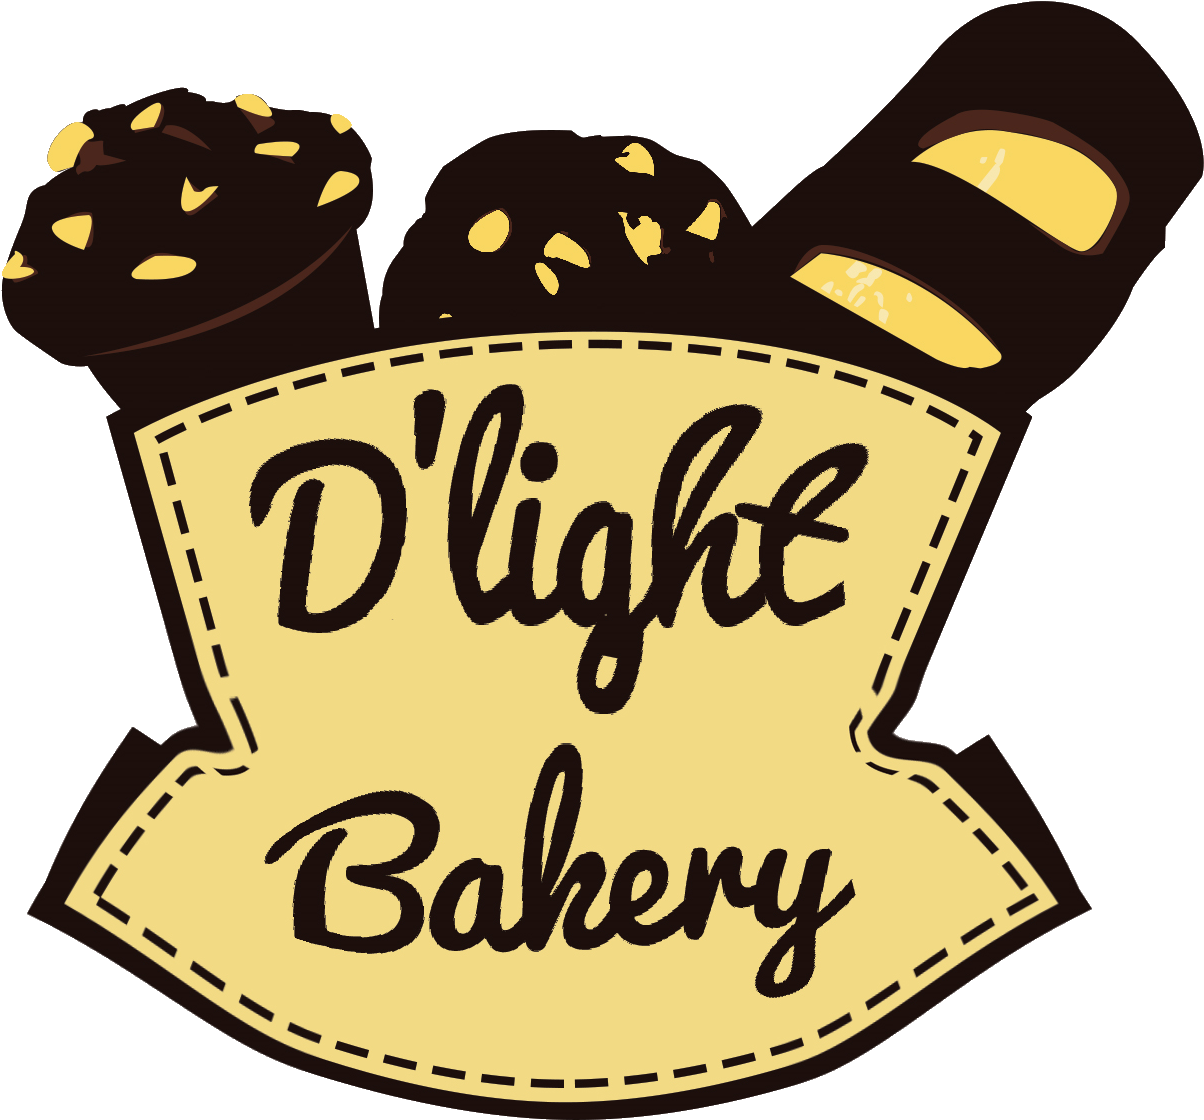 Delight Bakery Logo.